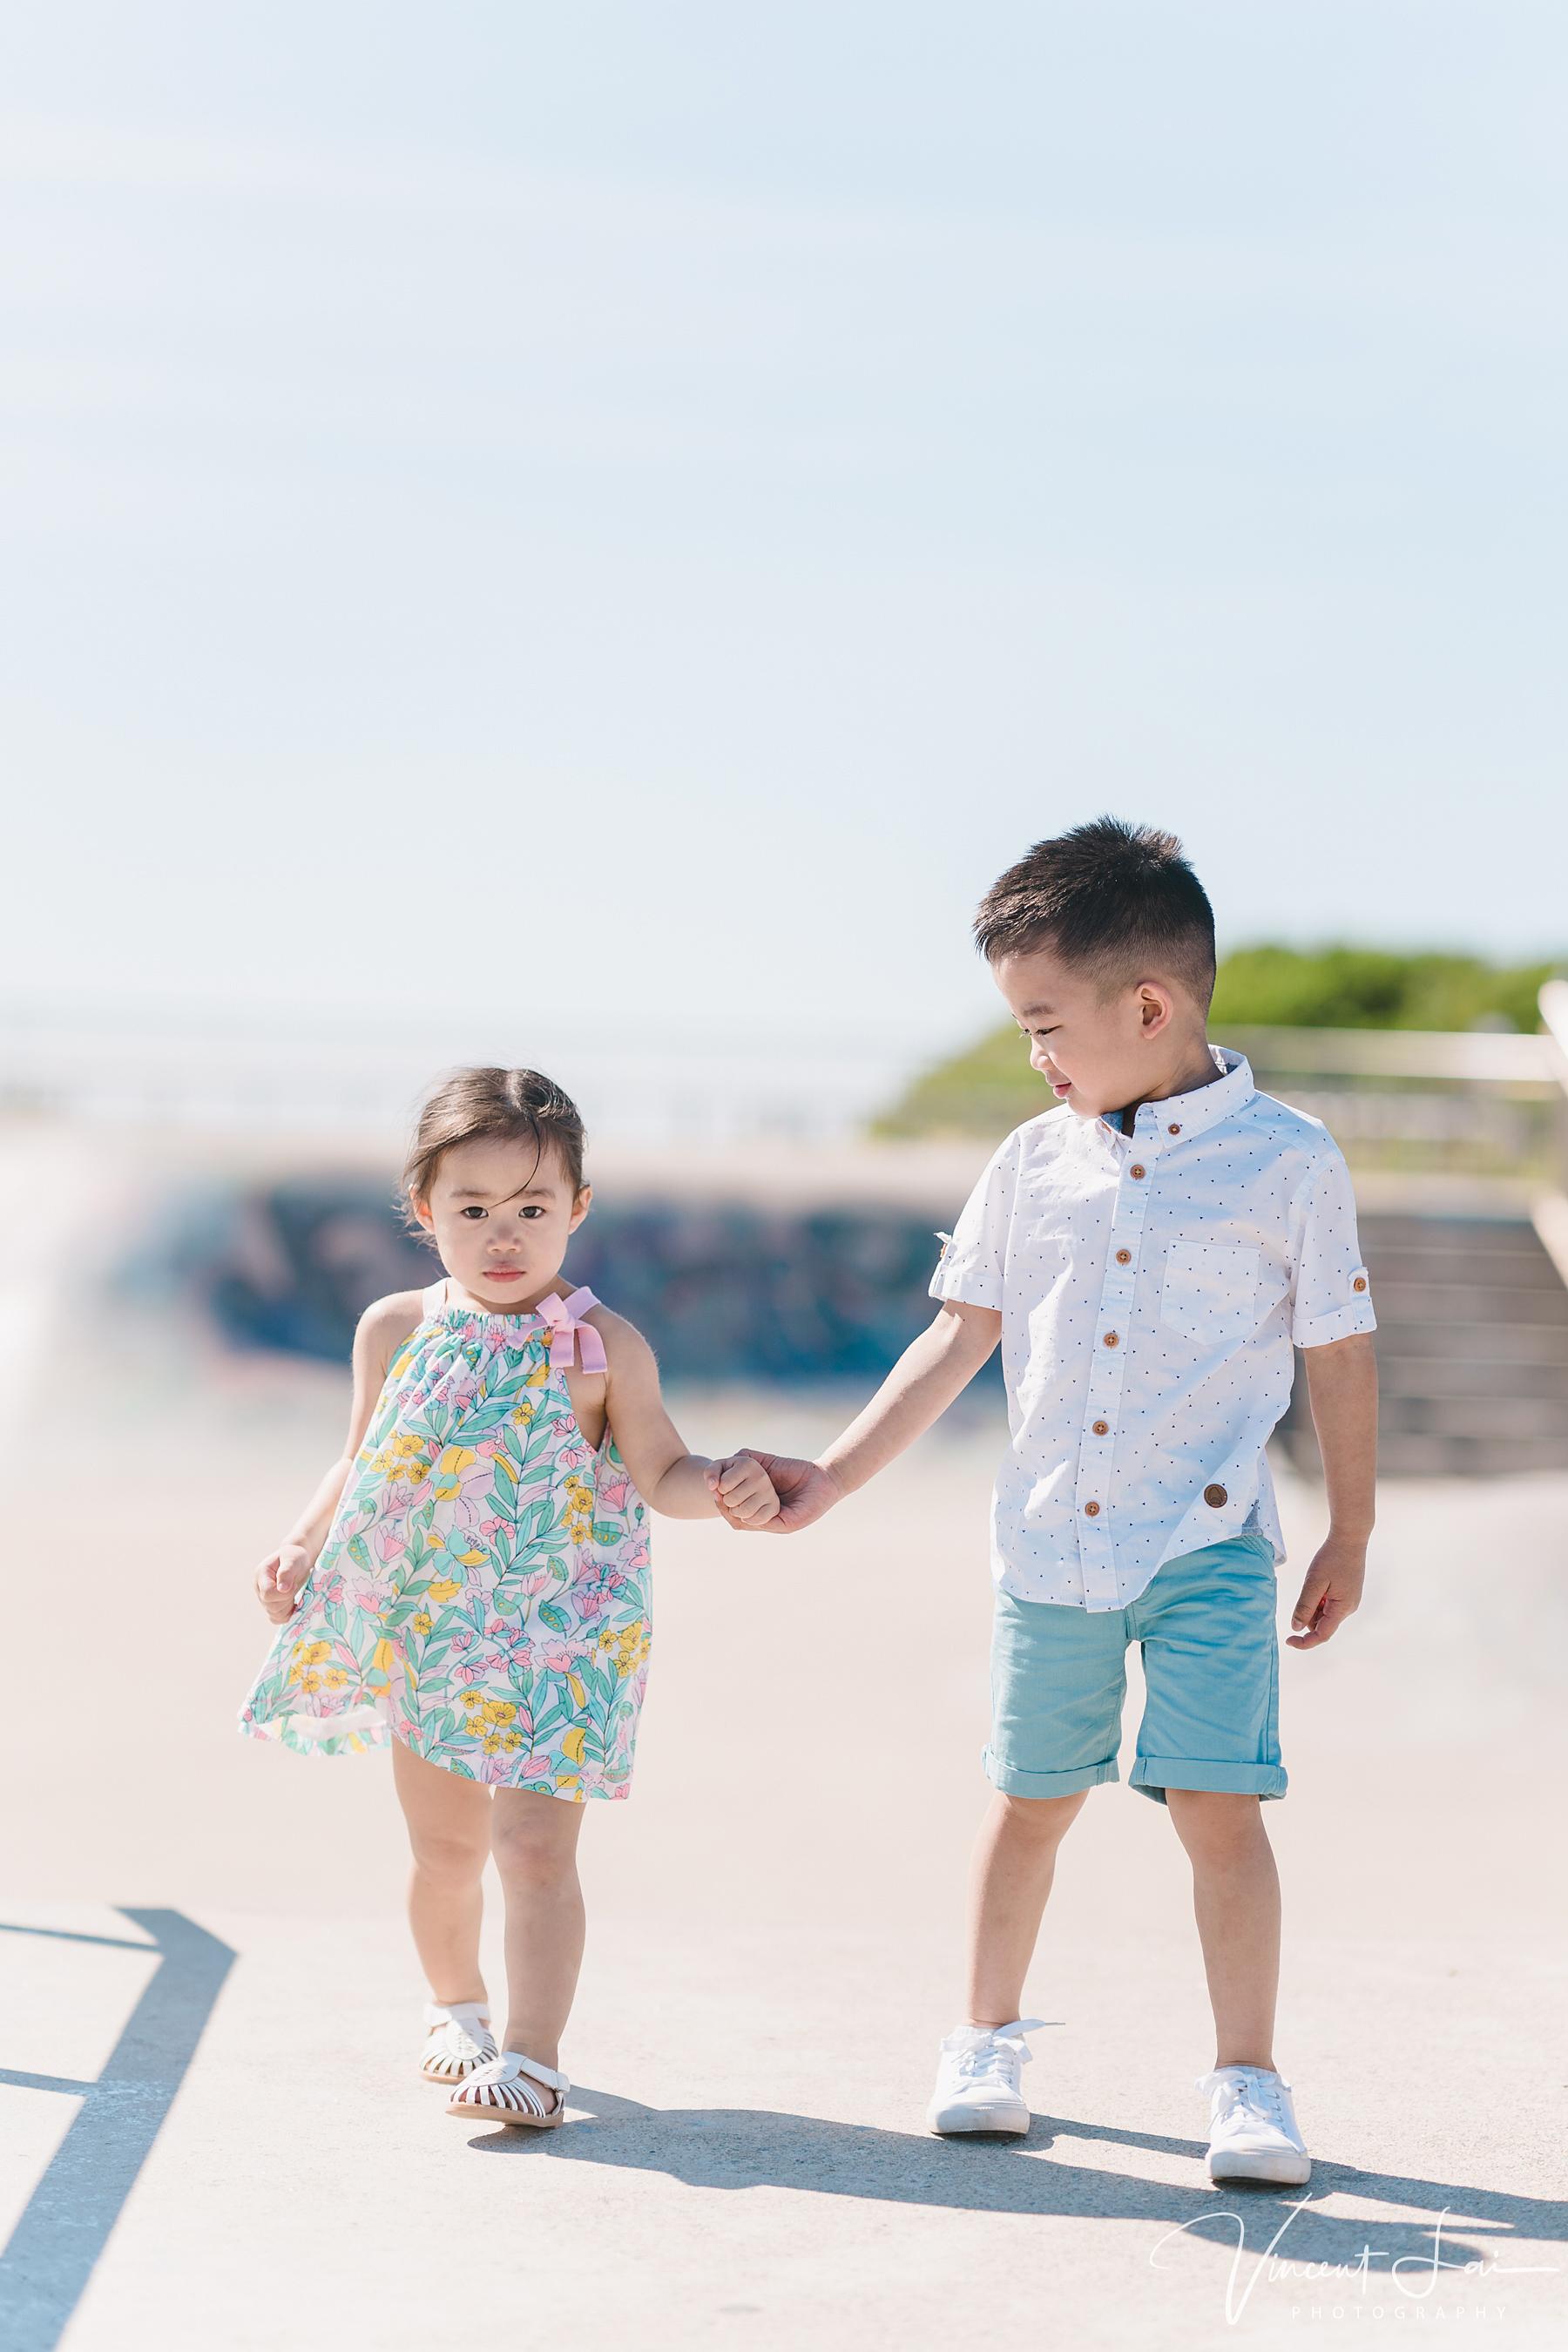 Family Photo Session at Maroubra Beach